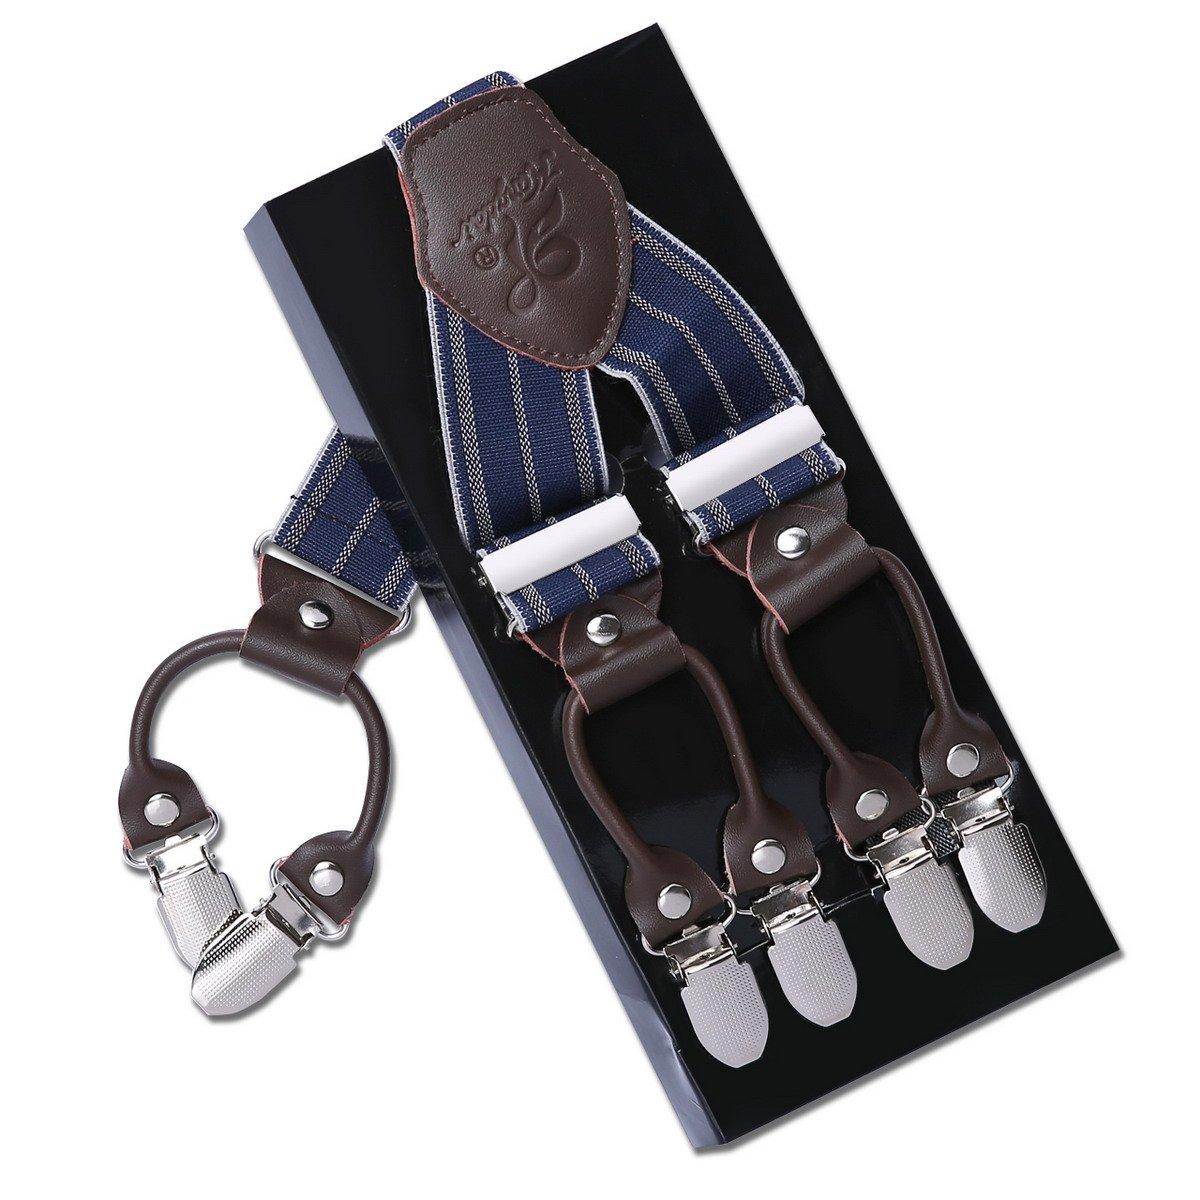 Heavy Duty Y-Shape Braces Suspenders with 6 Clip Design